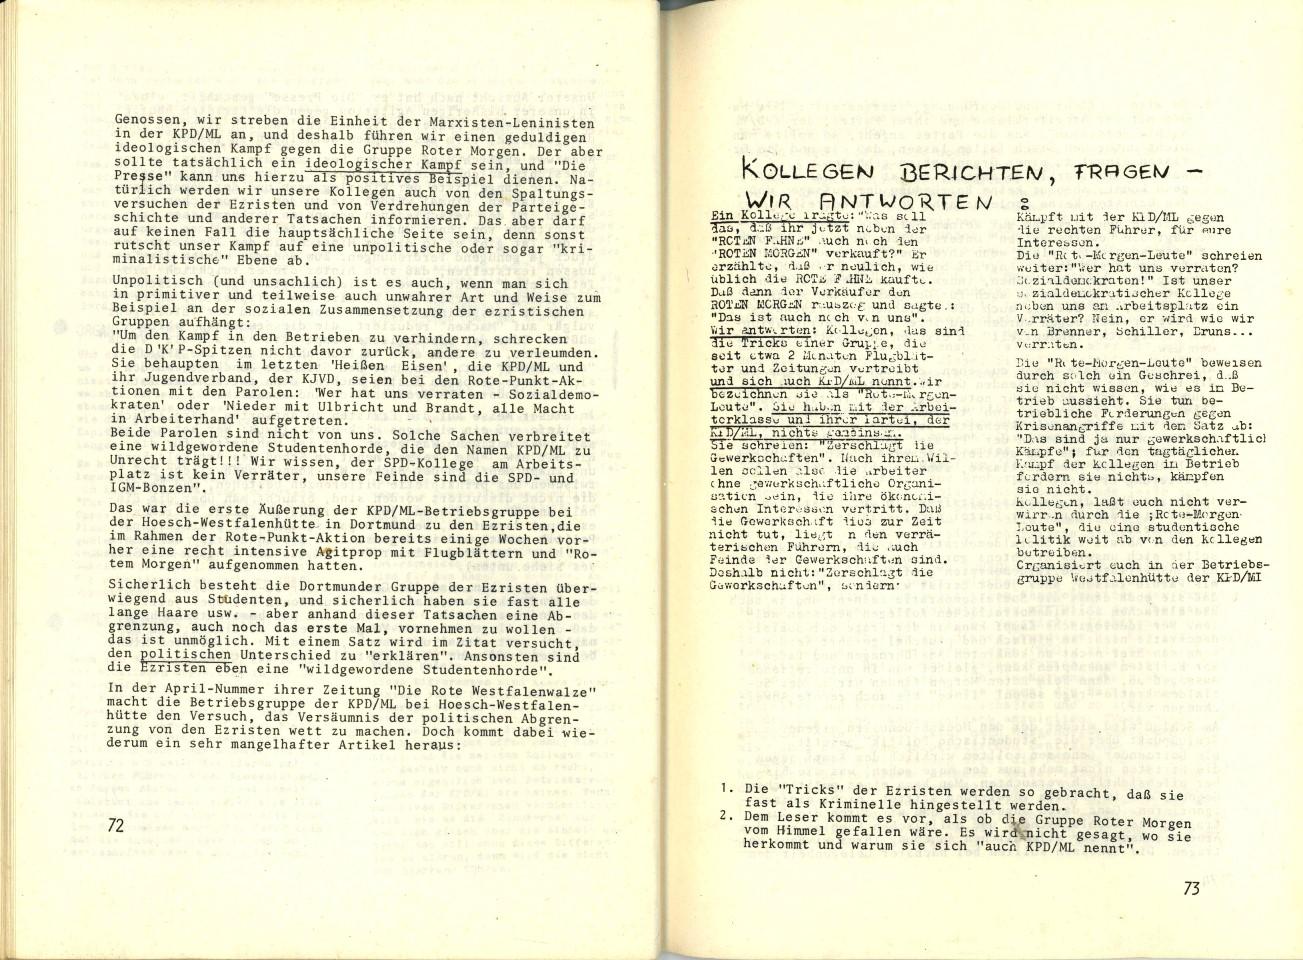 ZB_Parteiarbeiter_1971_06_38